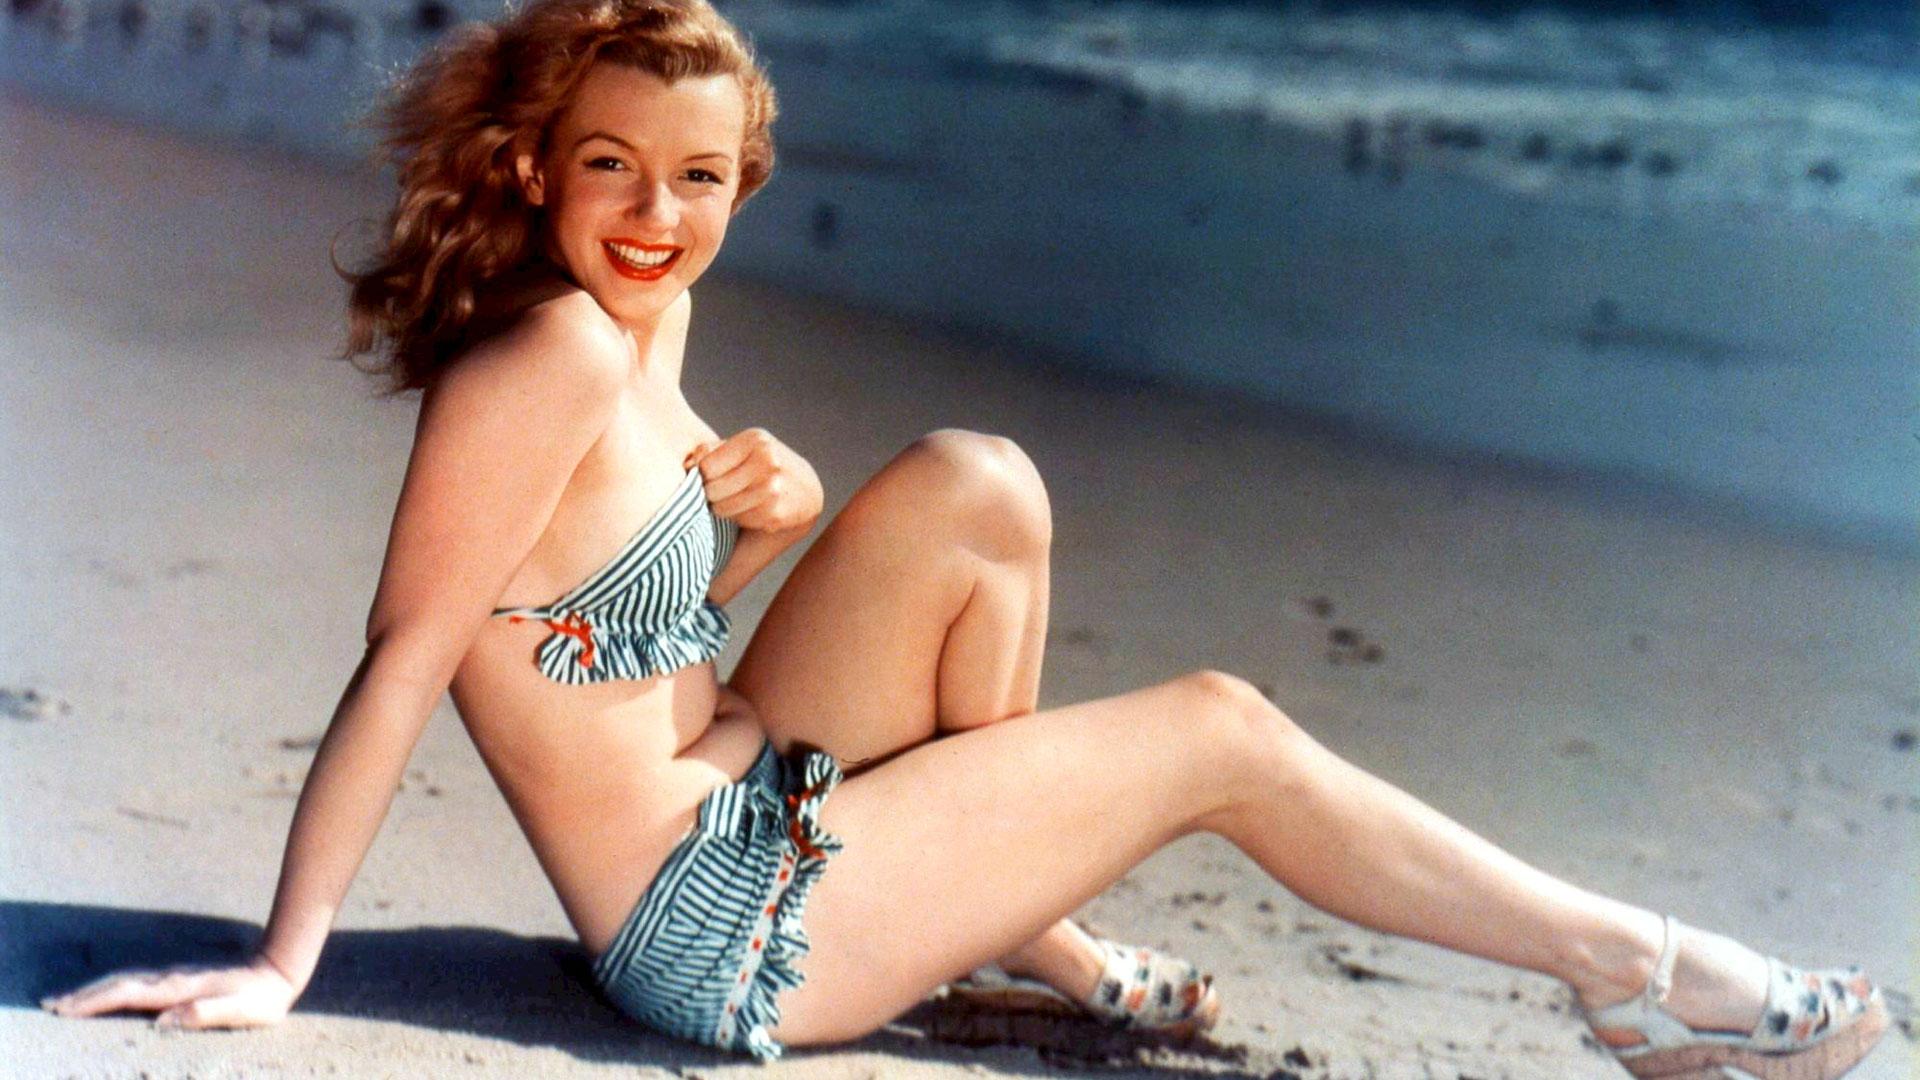 Années 1940, Marilyn Monroe en bikini